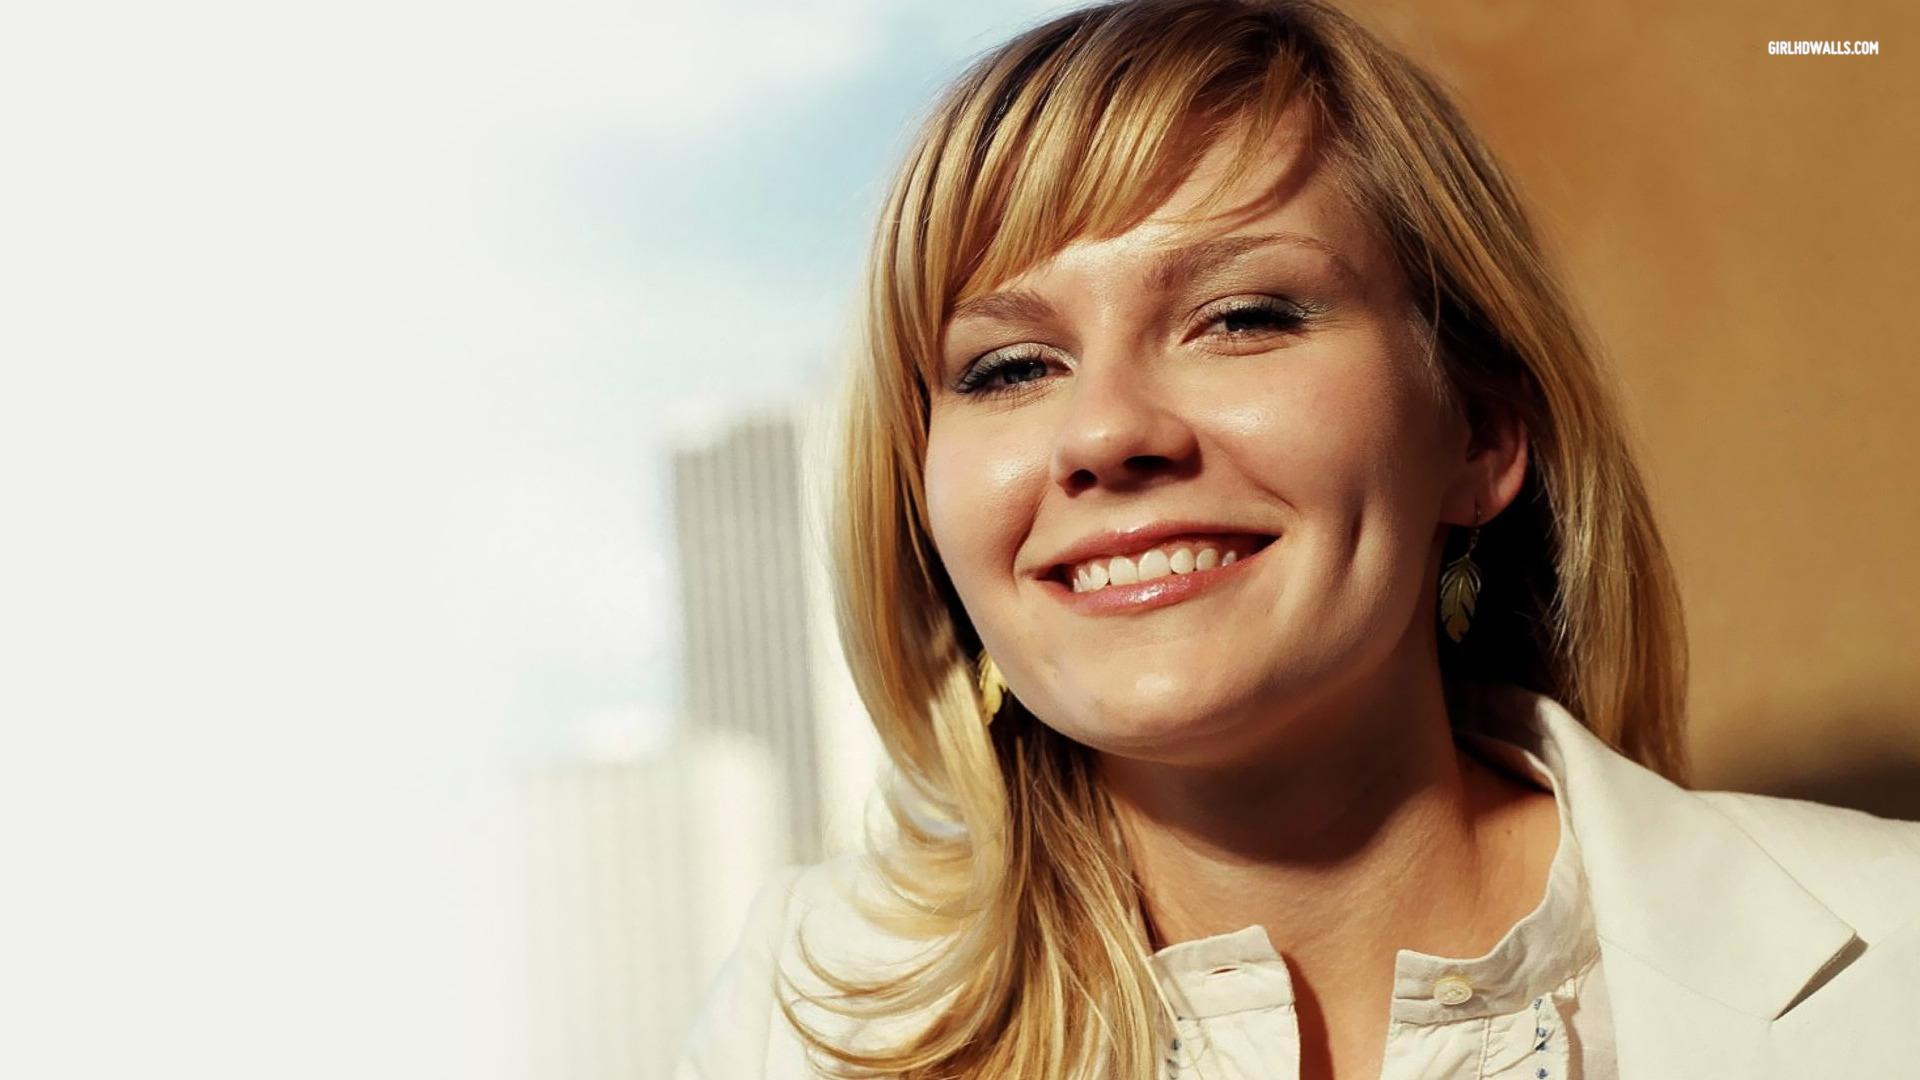 Kirsten Dunst For Desktop Background